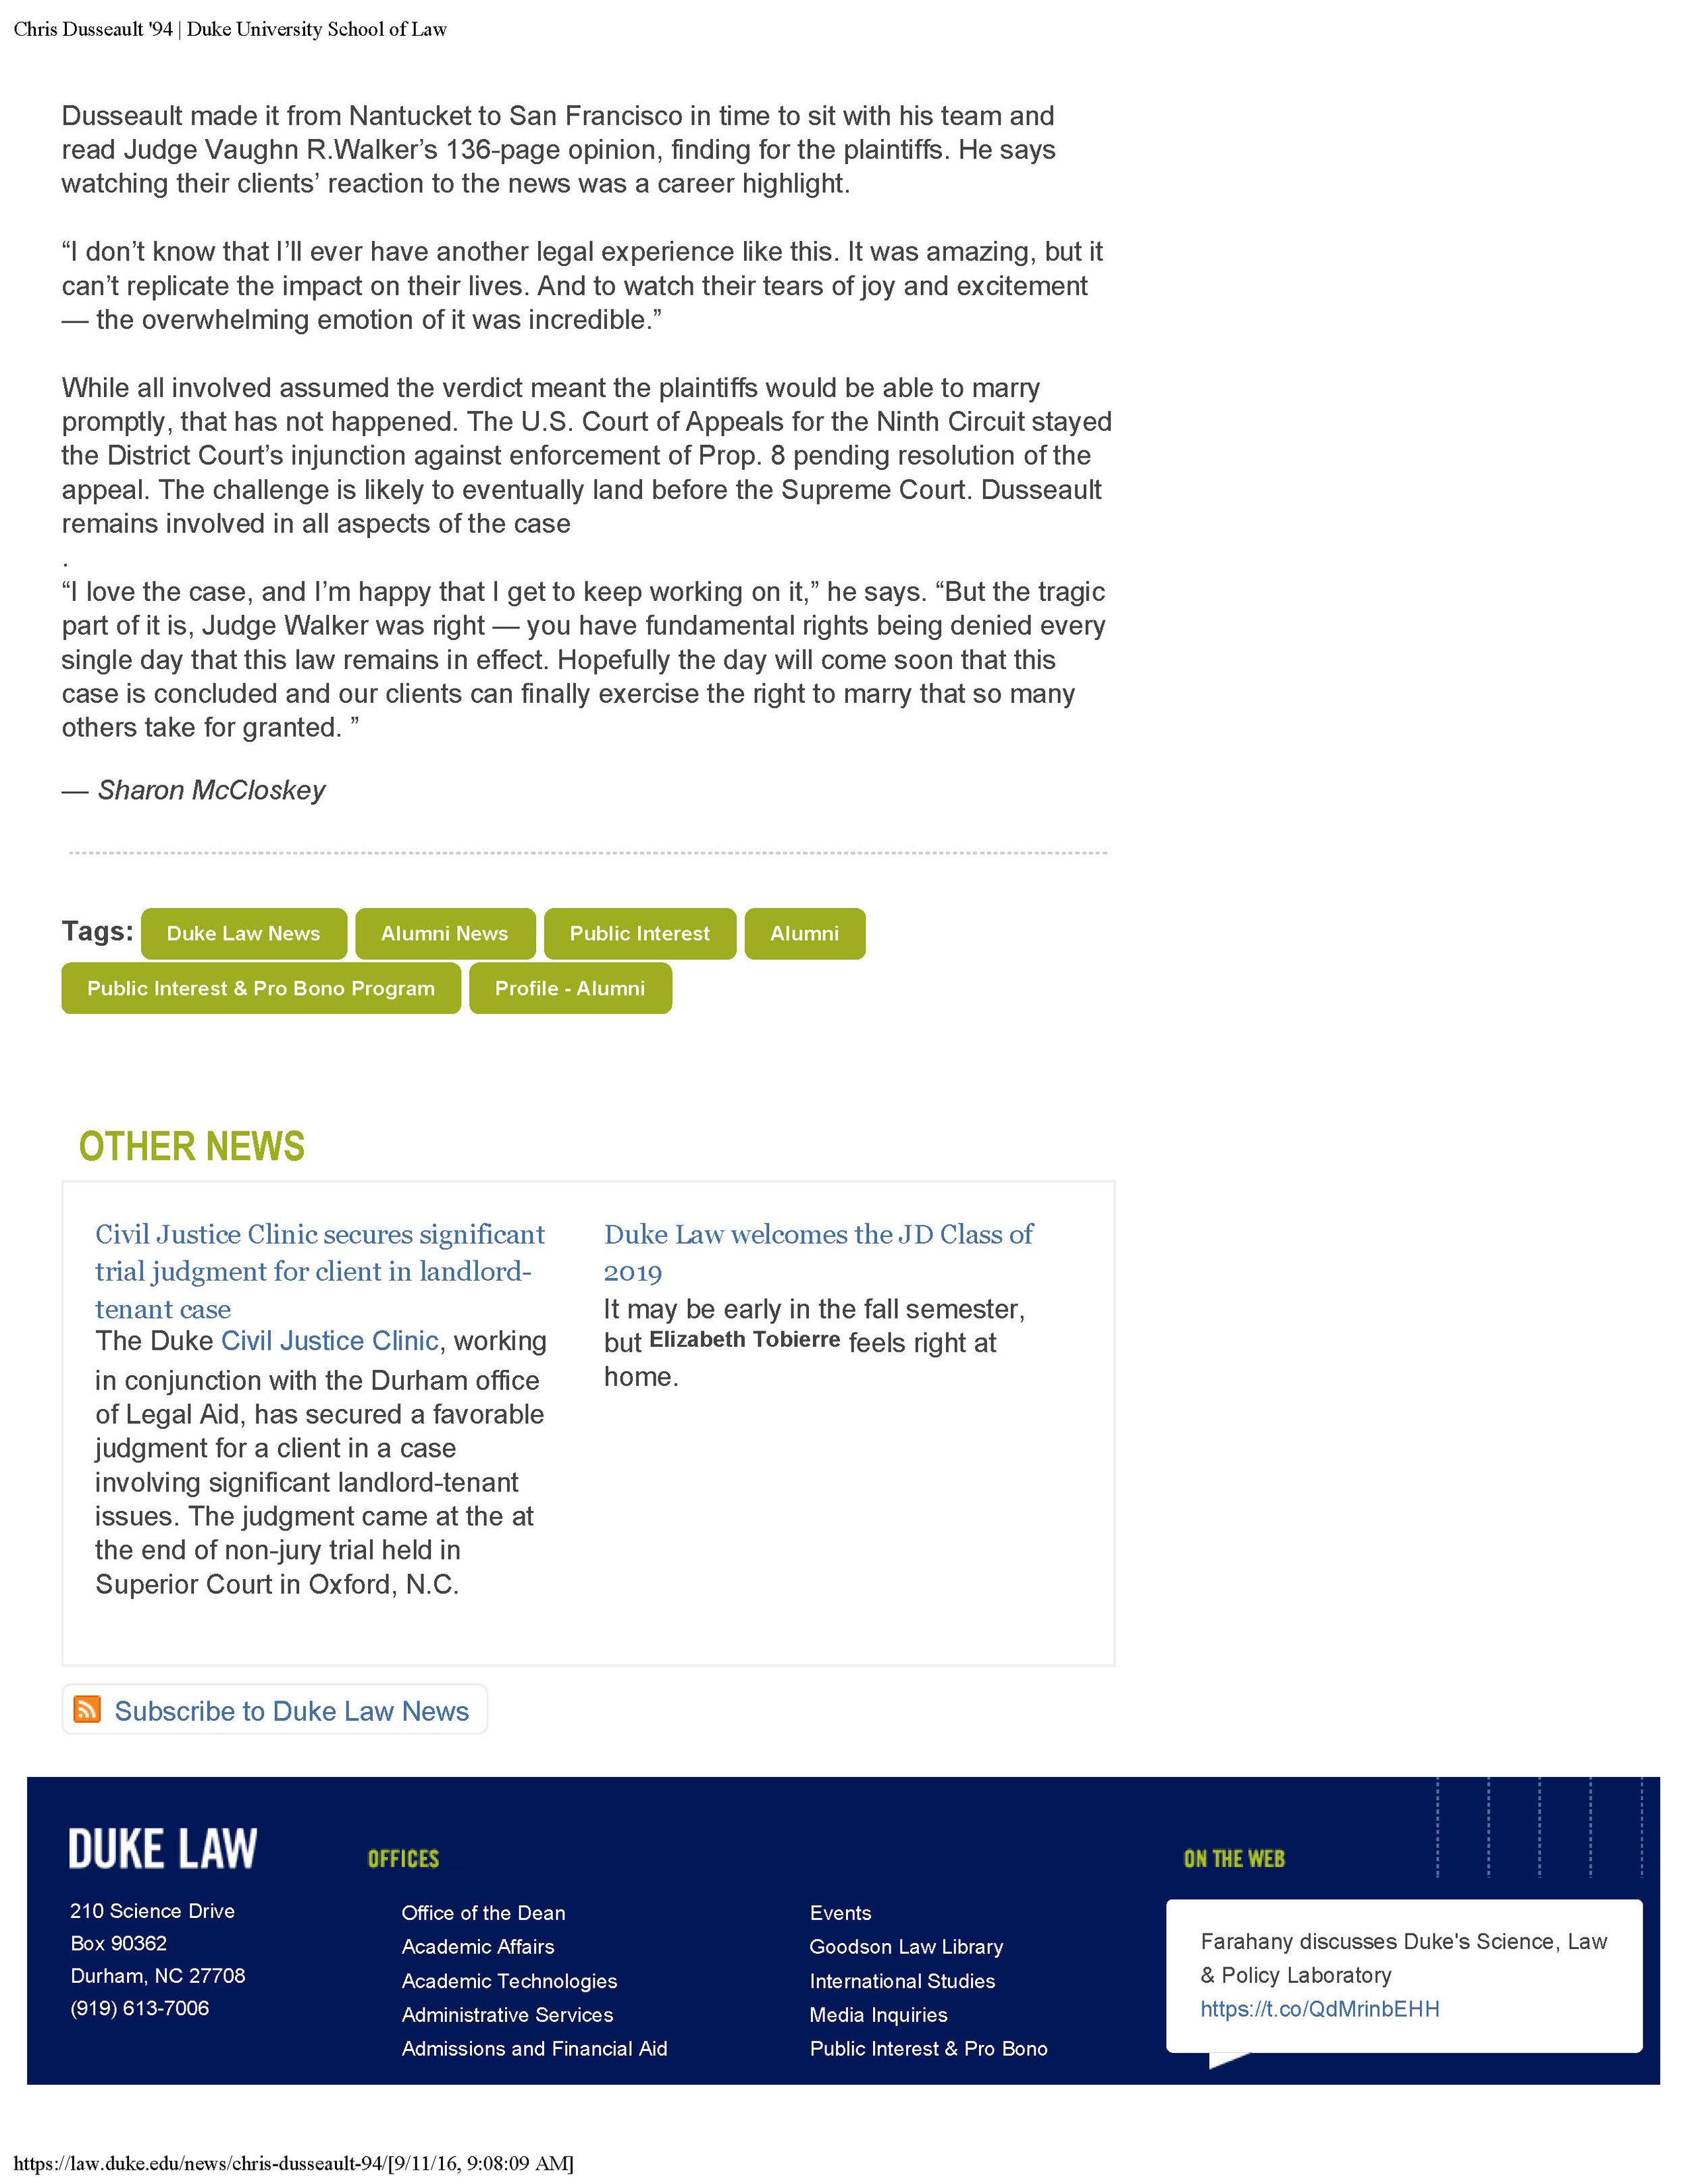 Sharon McCloskey - Chris Dusseault '94 - Duke University School of Law_Page_3.jpg